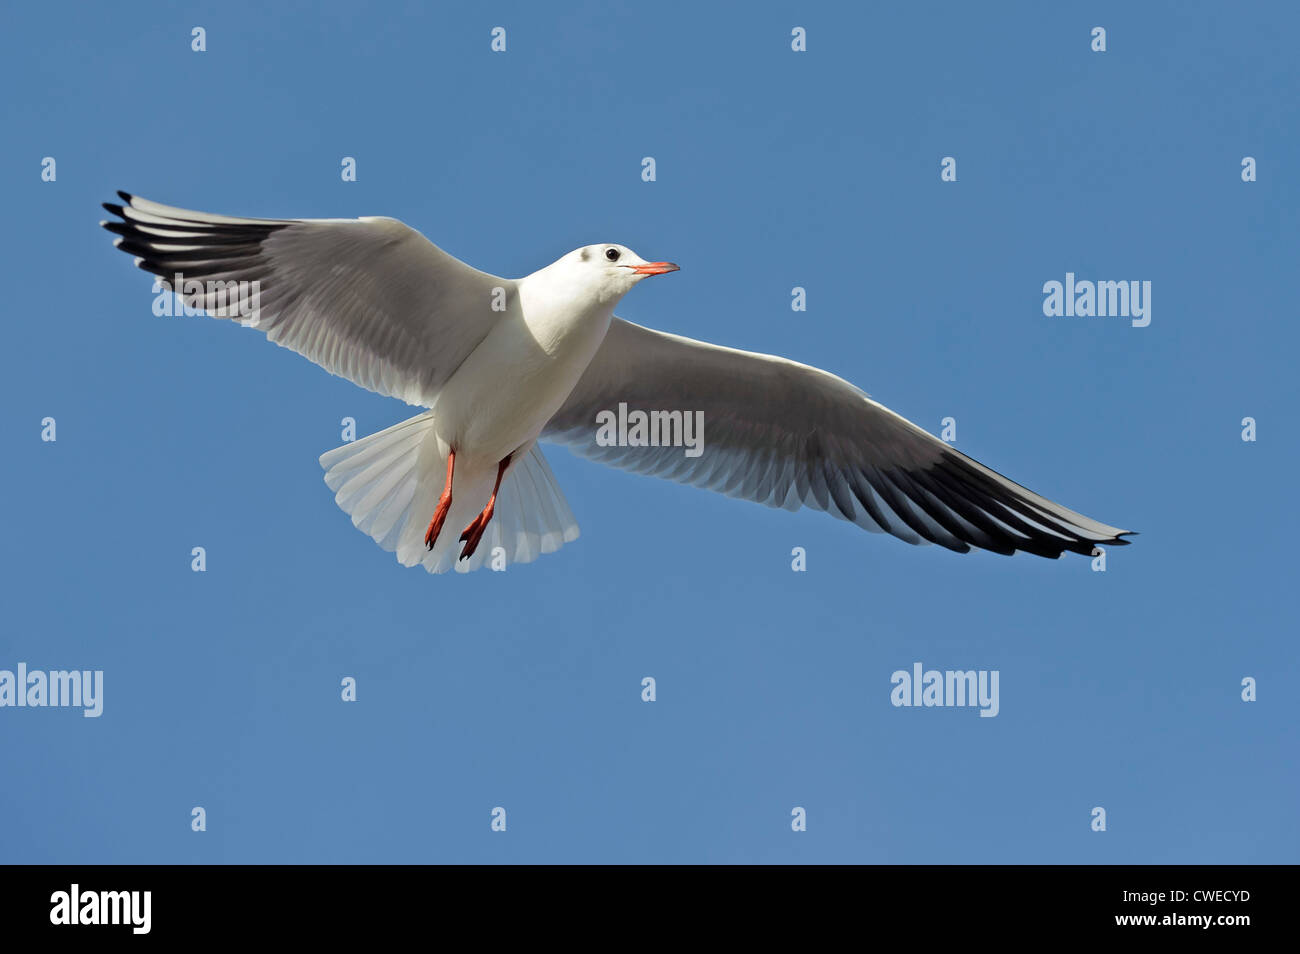 Black-headed gull (Larus ridibundus) winter plumage adult in flight. Norfolk. November. Stock Photo